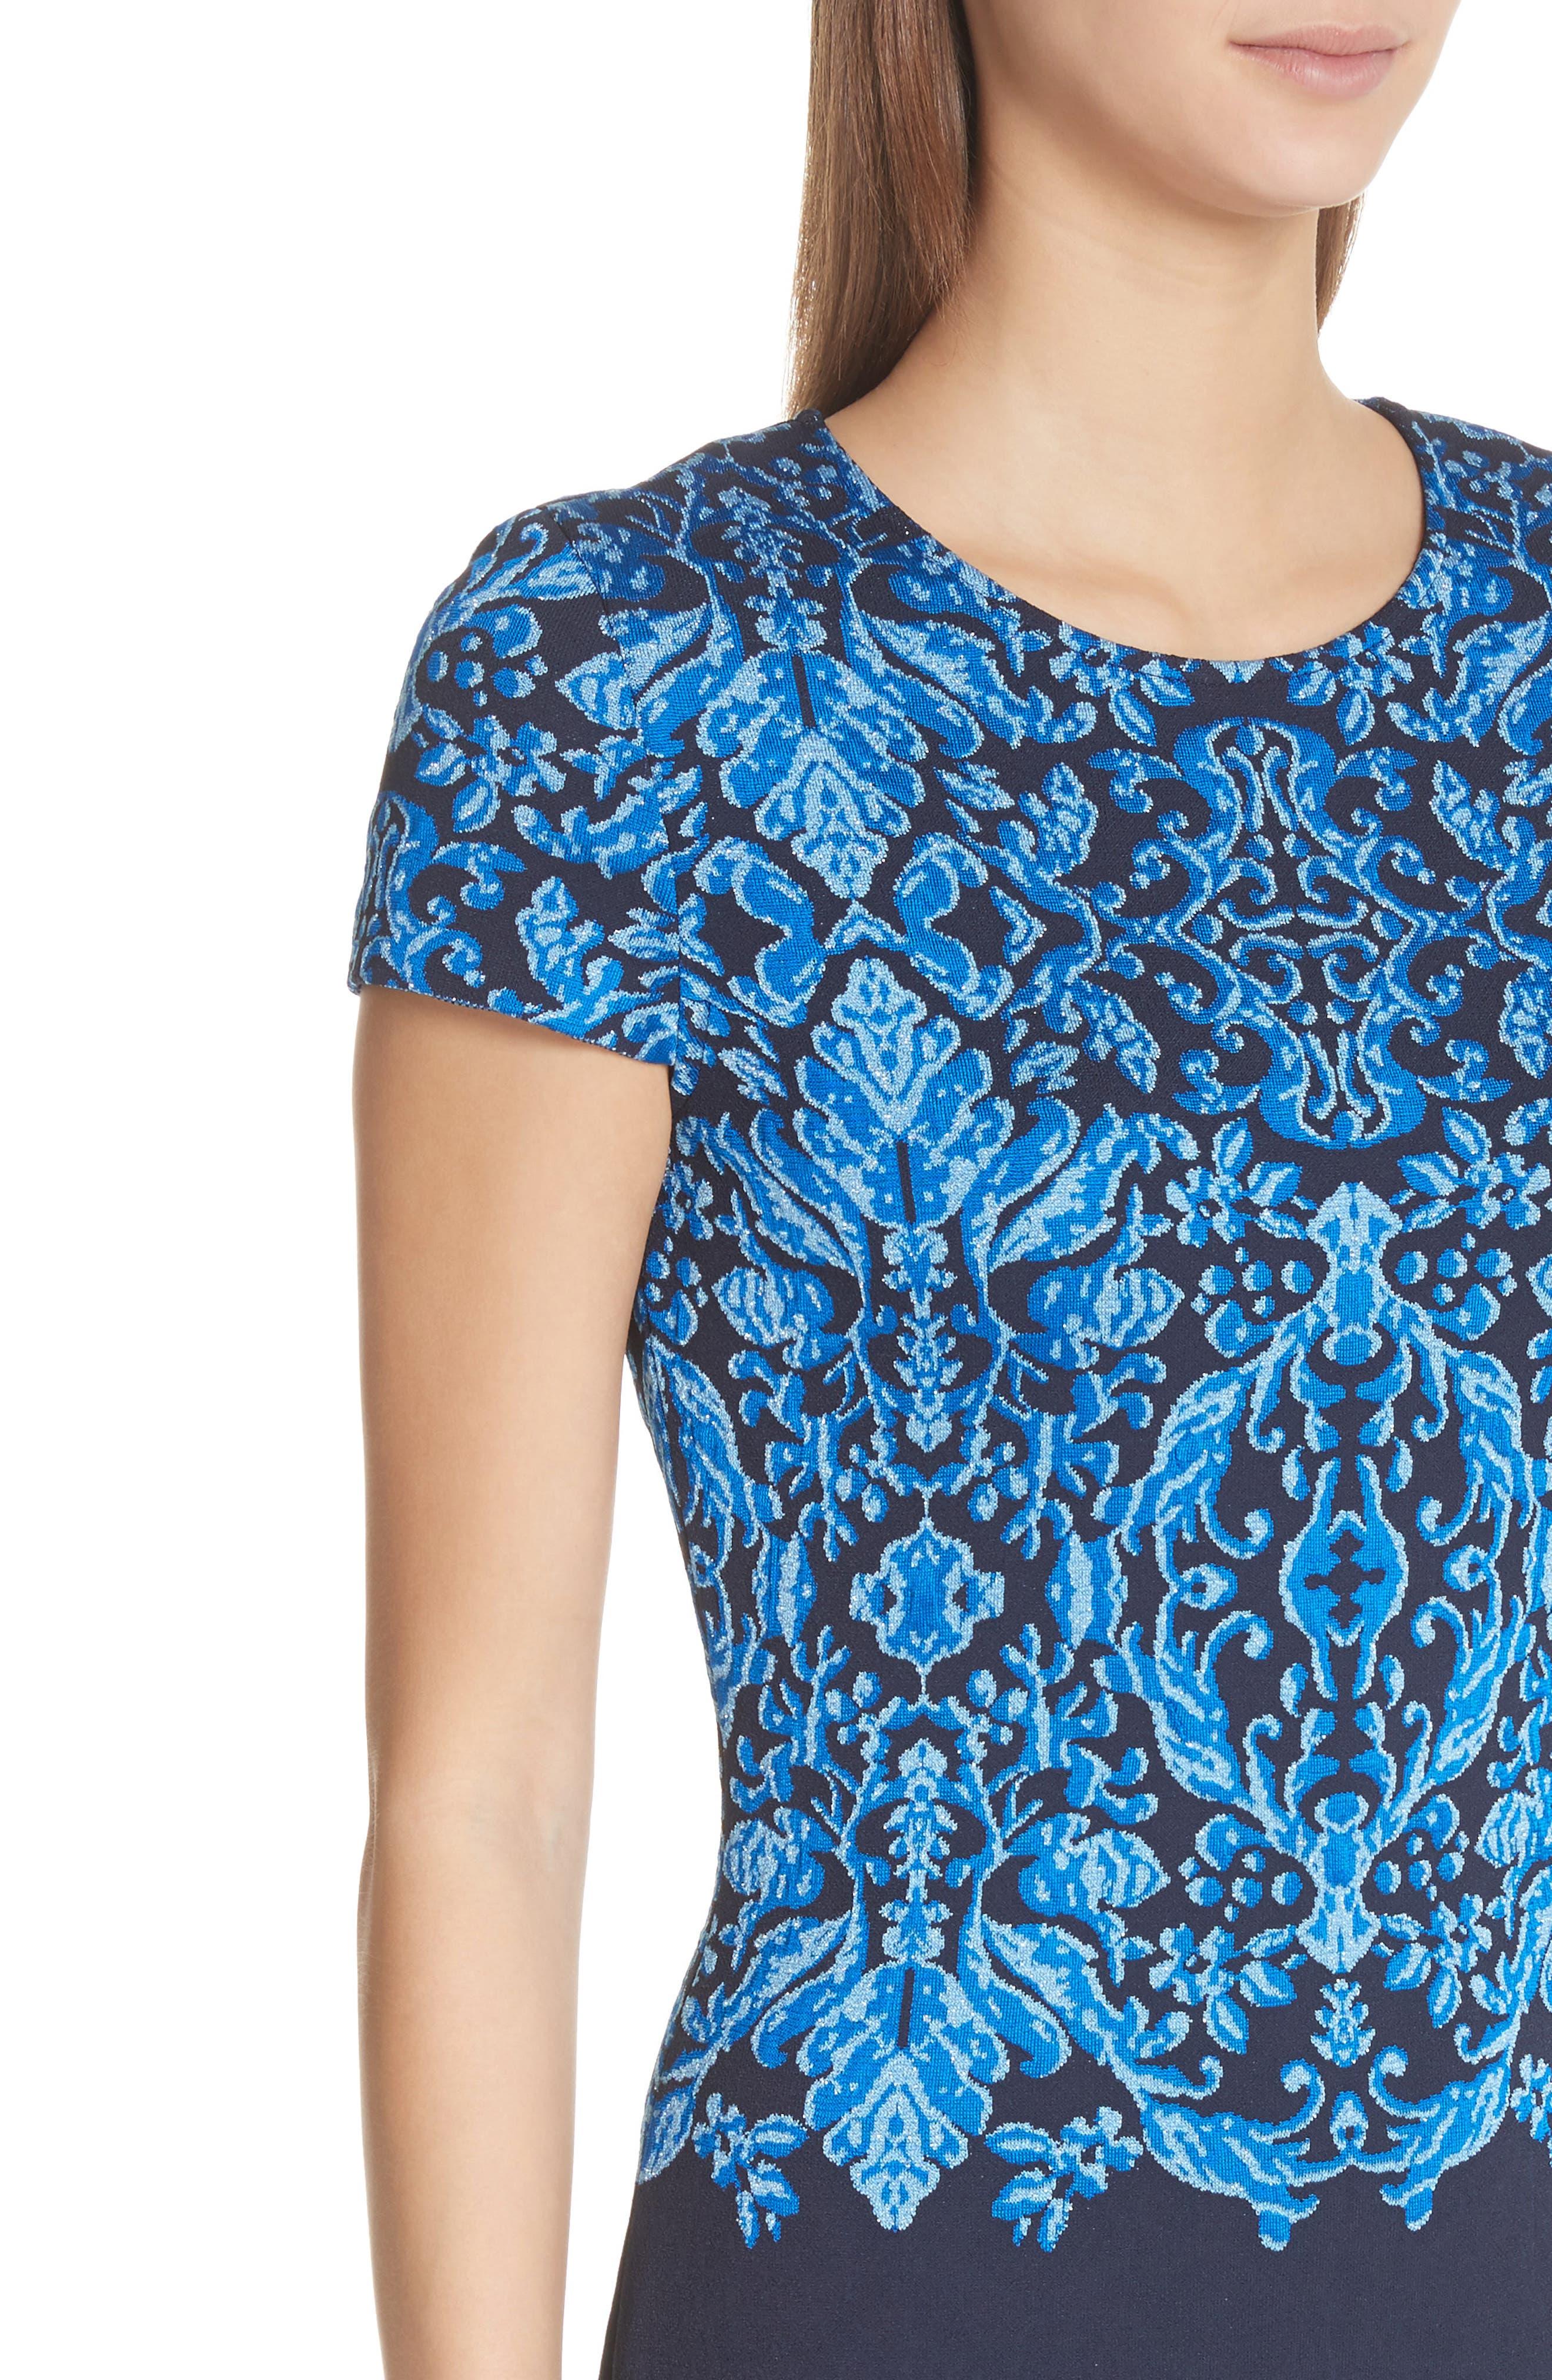 Cool Tones Brocade Knit Dress,                             Alternate thumbnail 4, color,                             Cobalt Multi